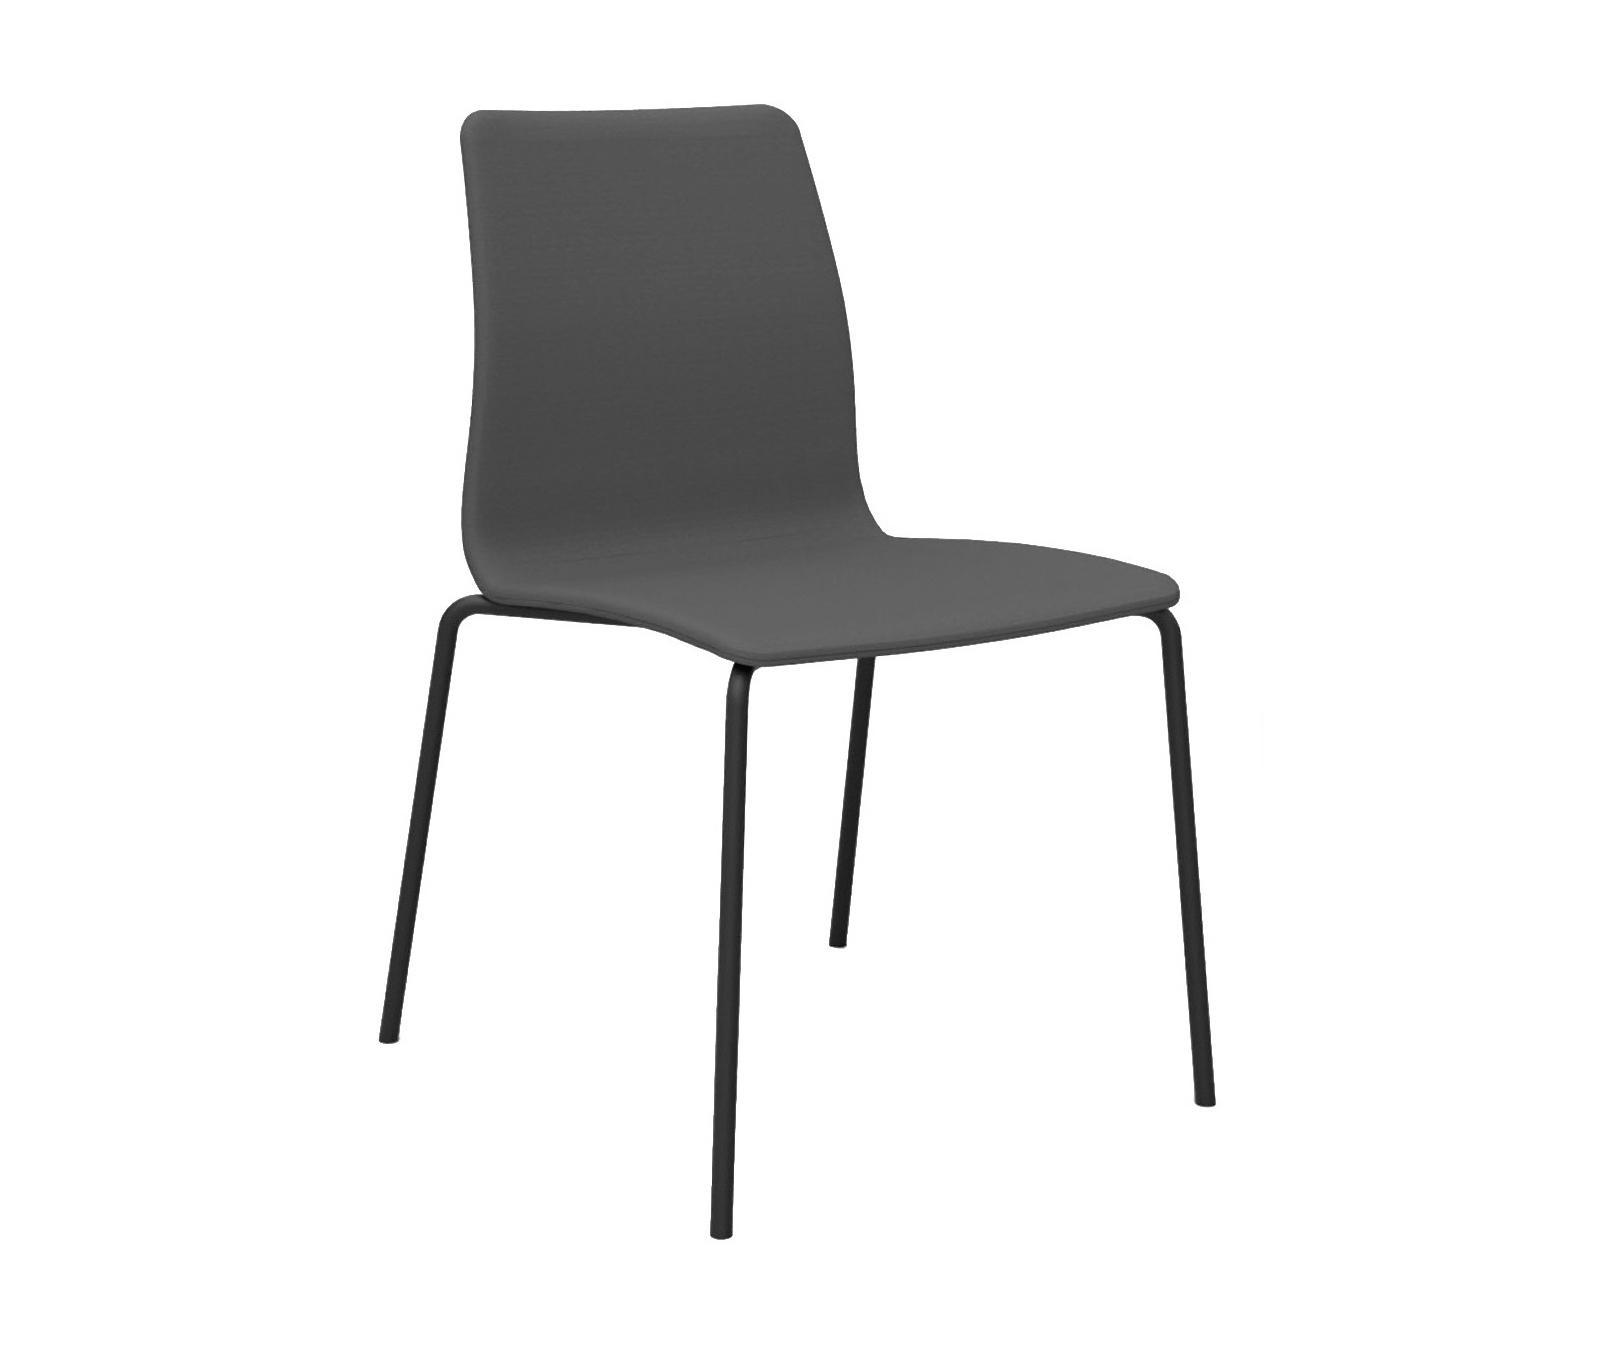 MAVERICK PLUS STAPELBARER OBJEKTSTUHL - Stühle von KFF   Architonic